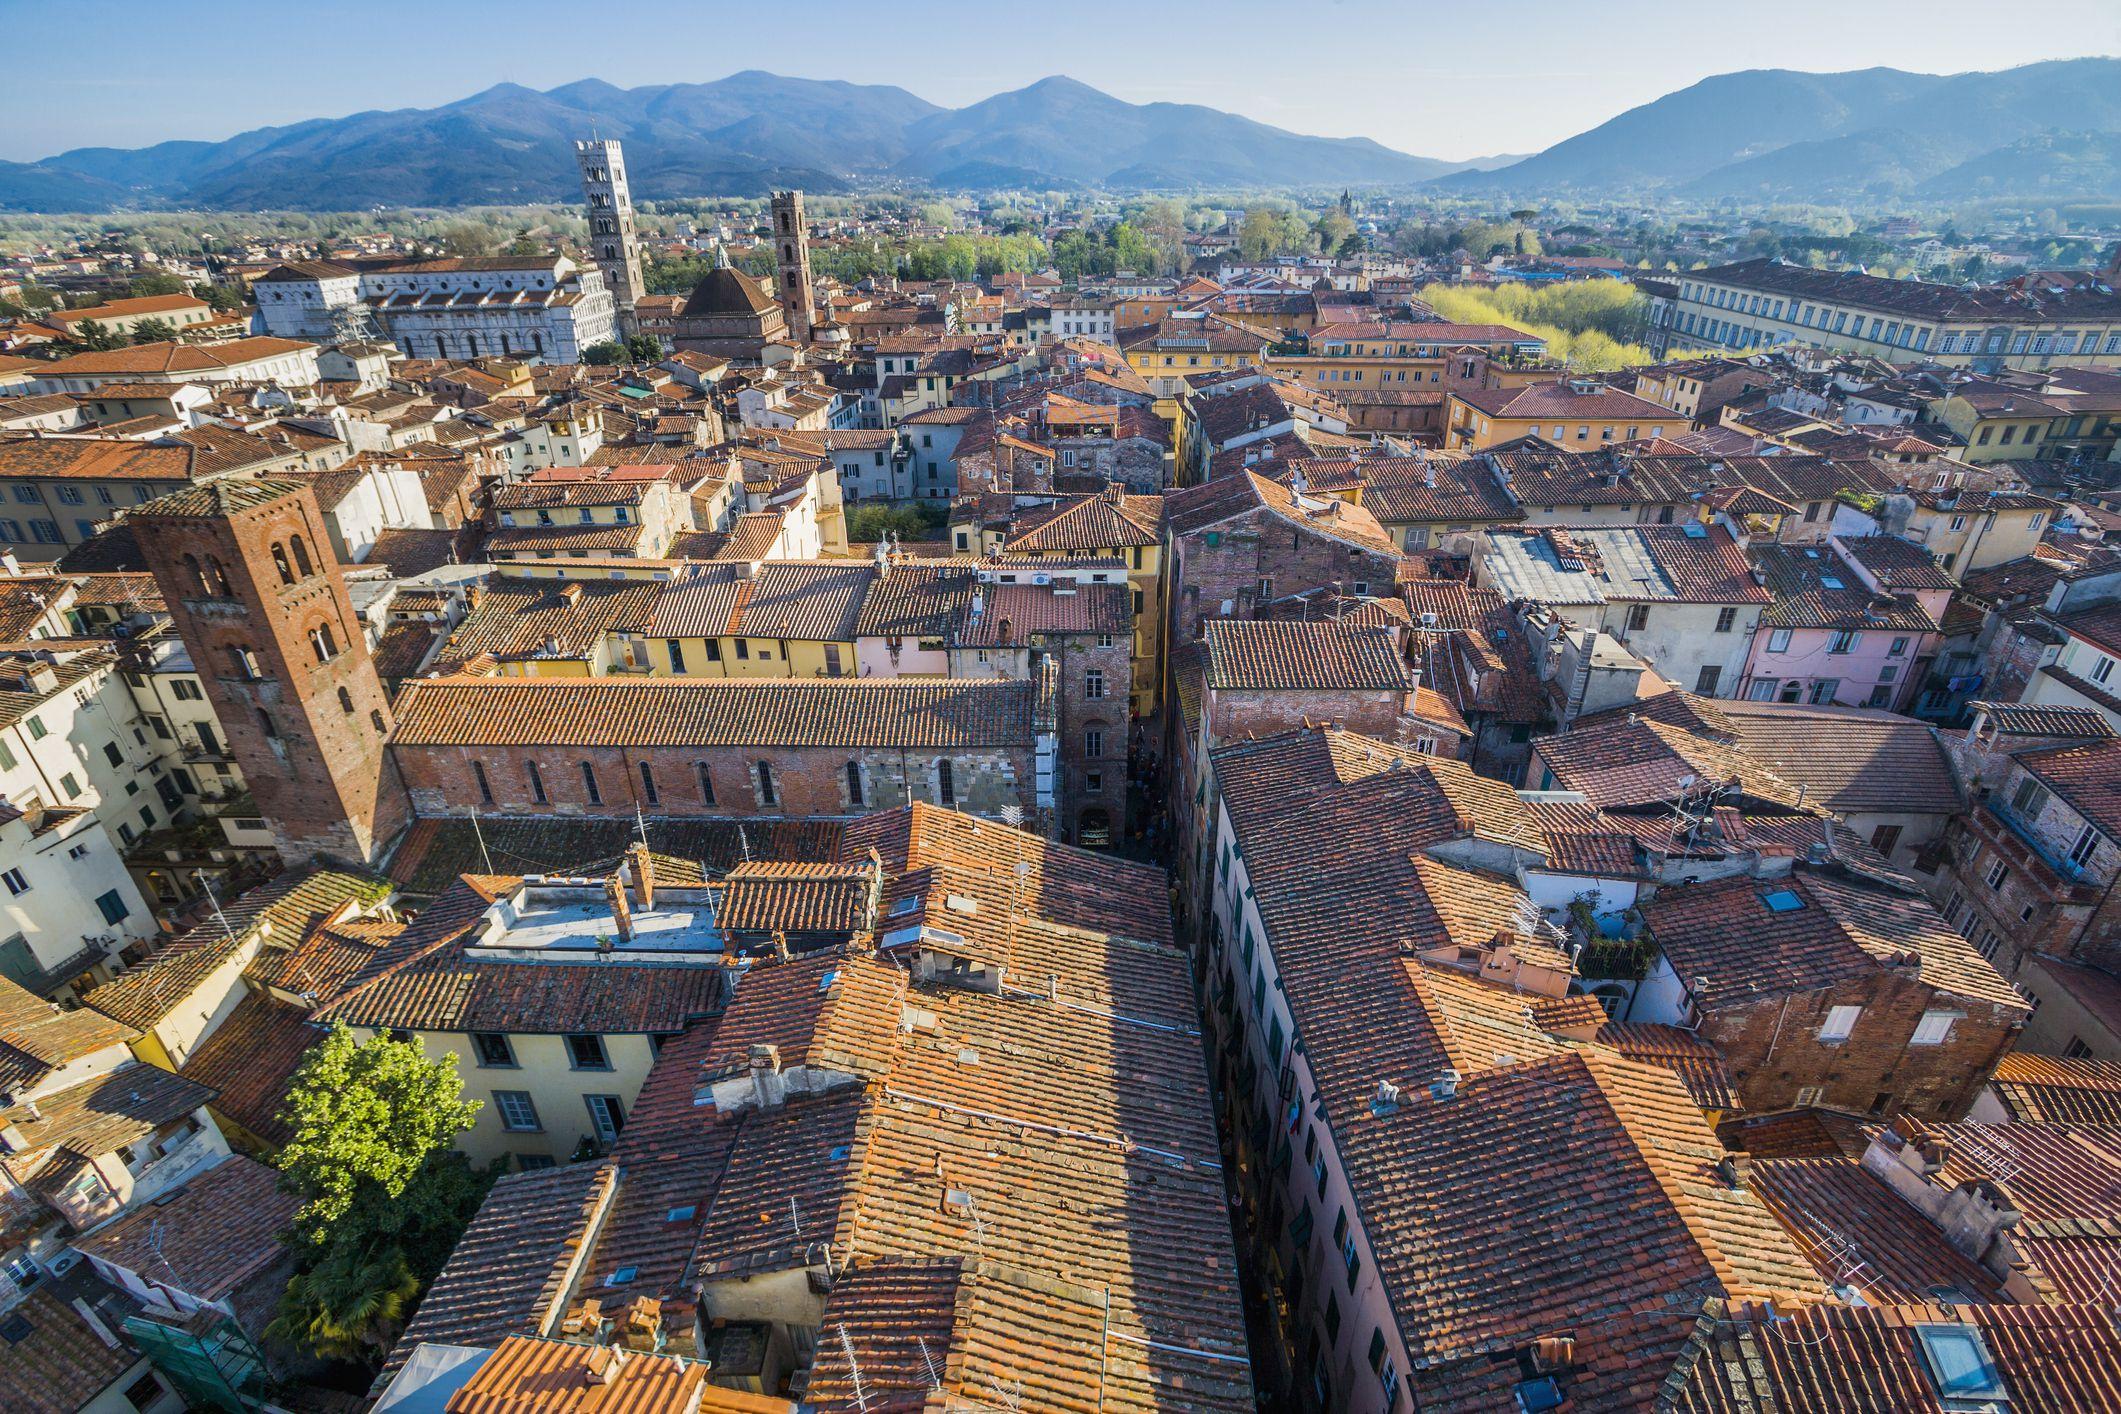 5 Best Cities to Visit - Italy Forum - TripAdvisor